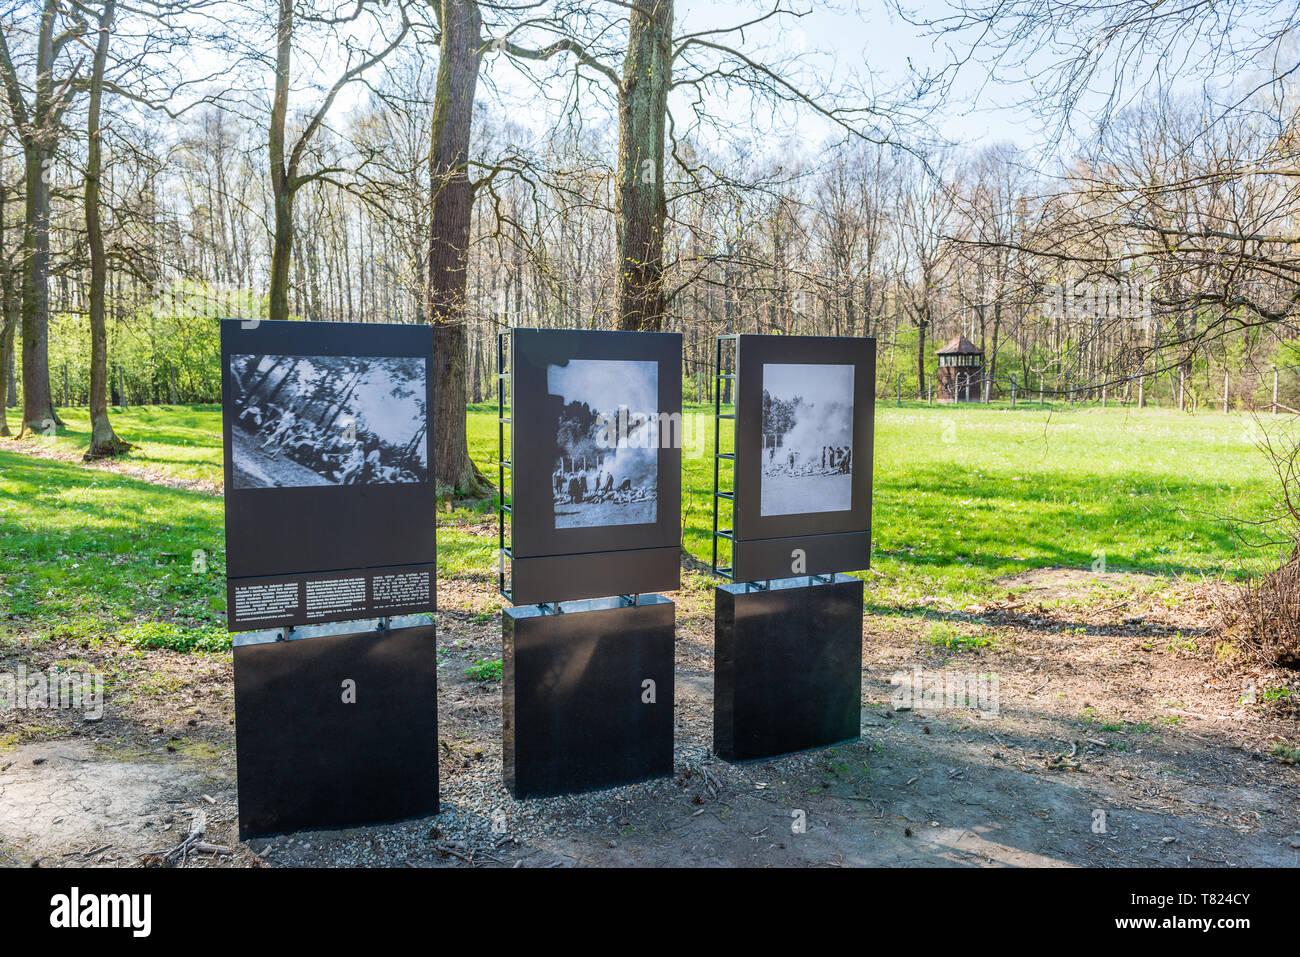 AUSCHWITZ (OSWIECIM), POLAND - APRIL 18, 2019: Corpse Burning site in Auschwitz Birkenau extermination camp, Poland. - Stock Image